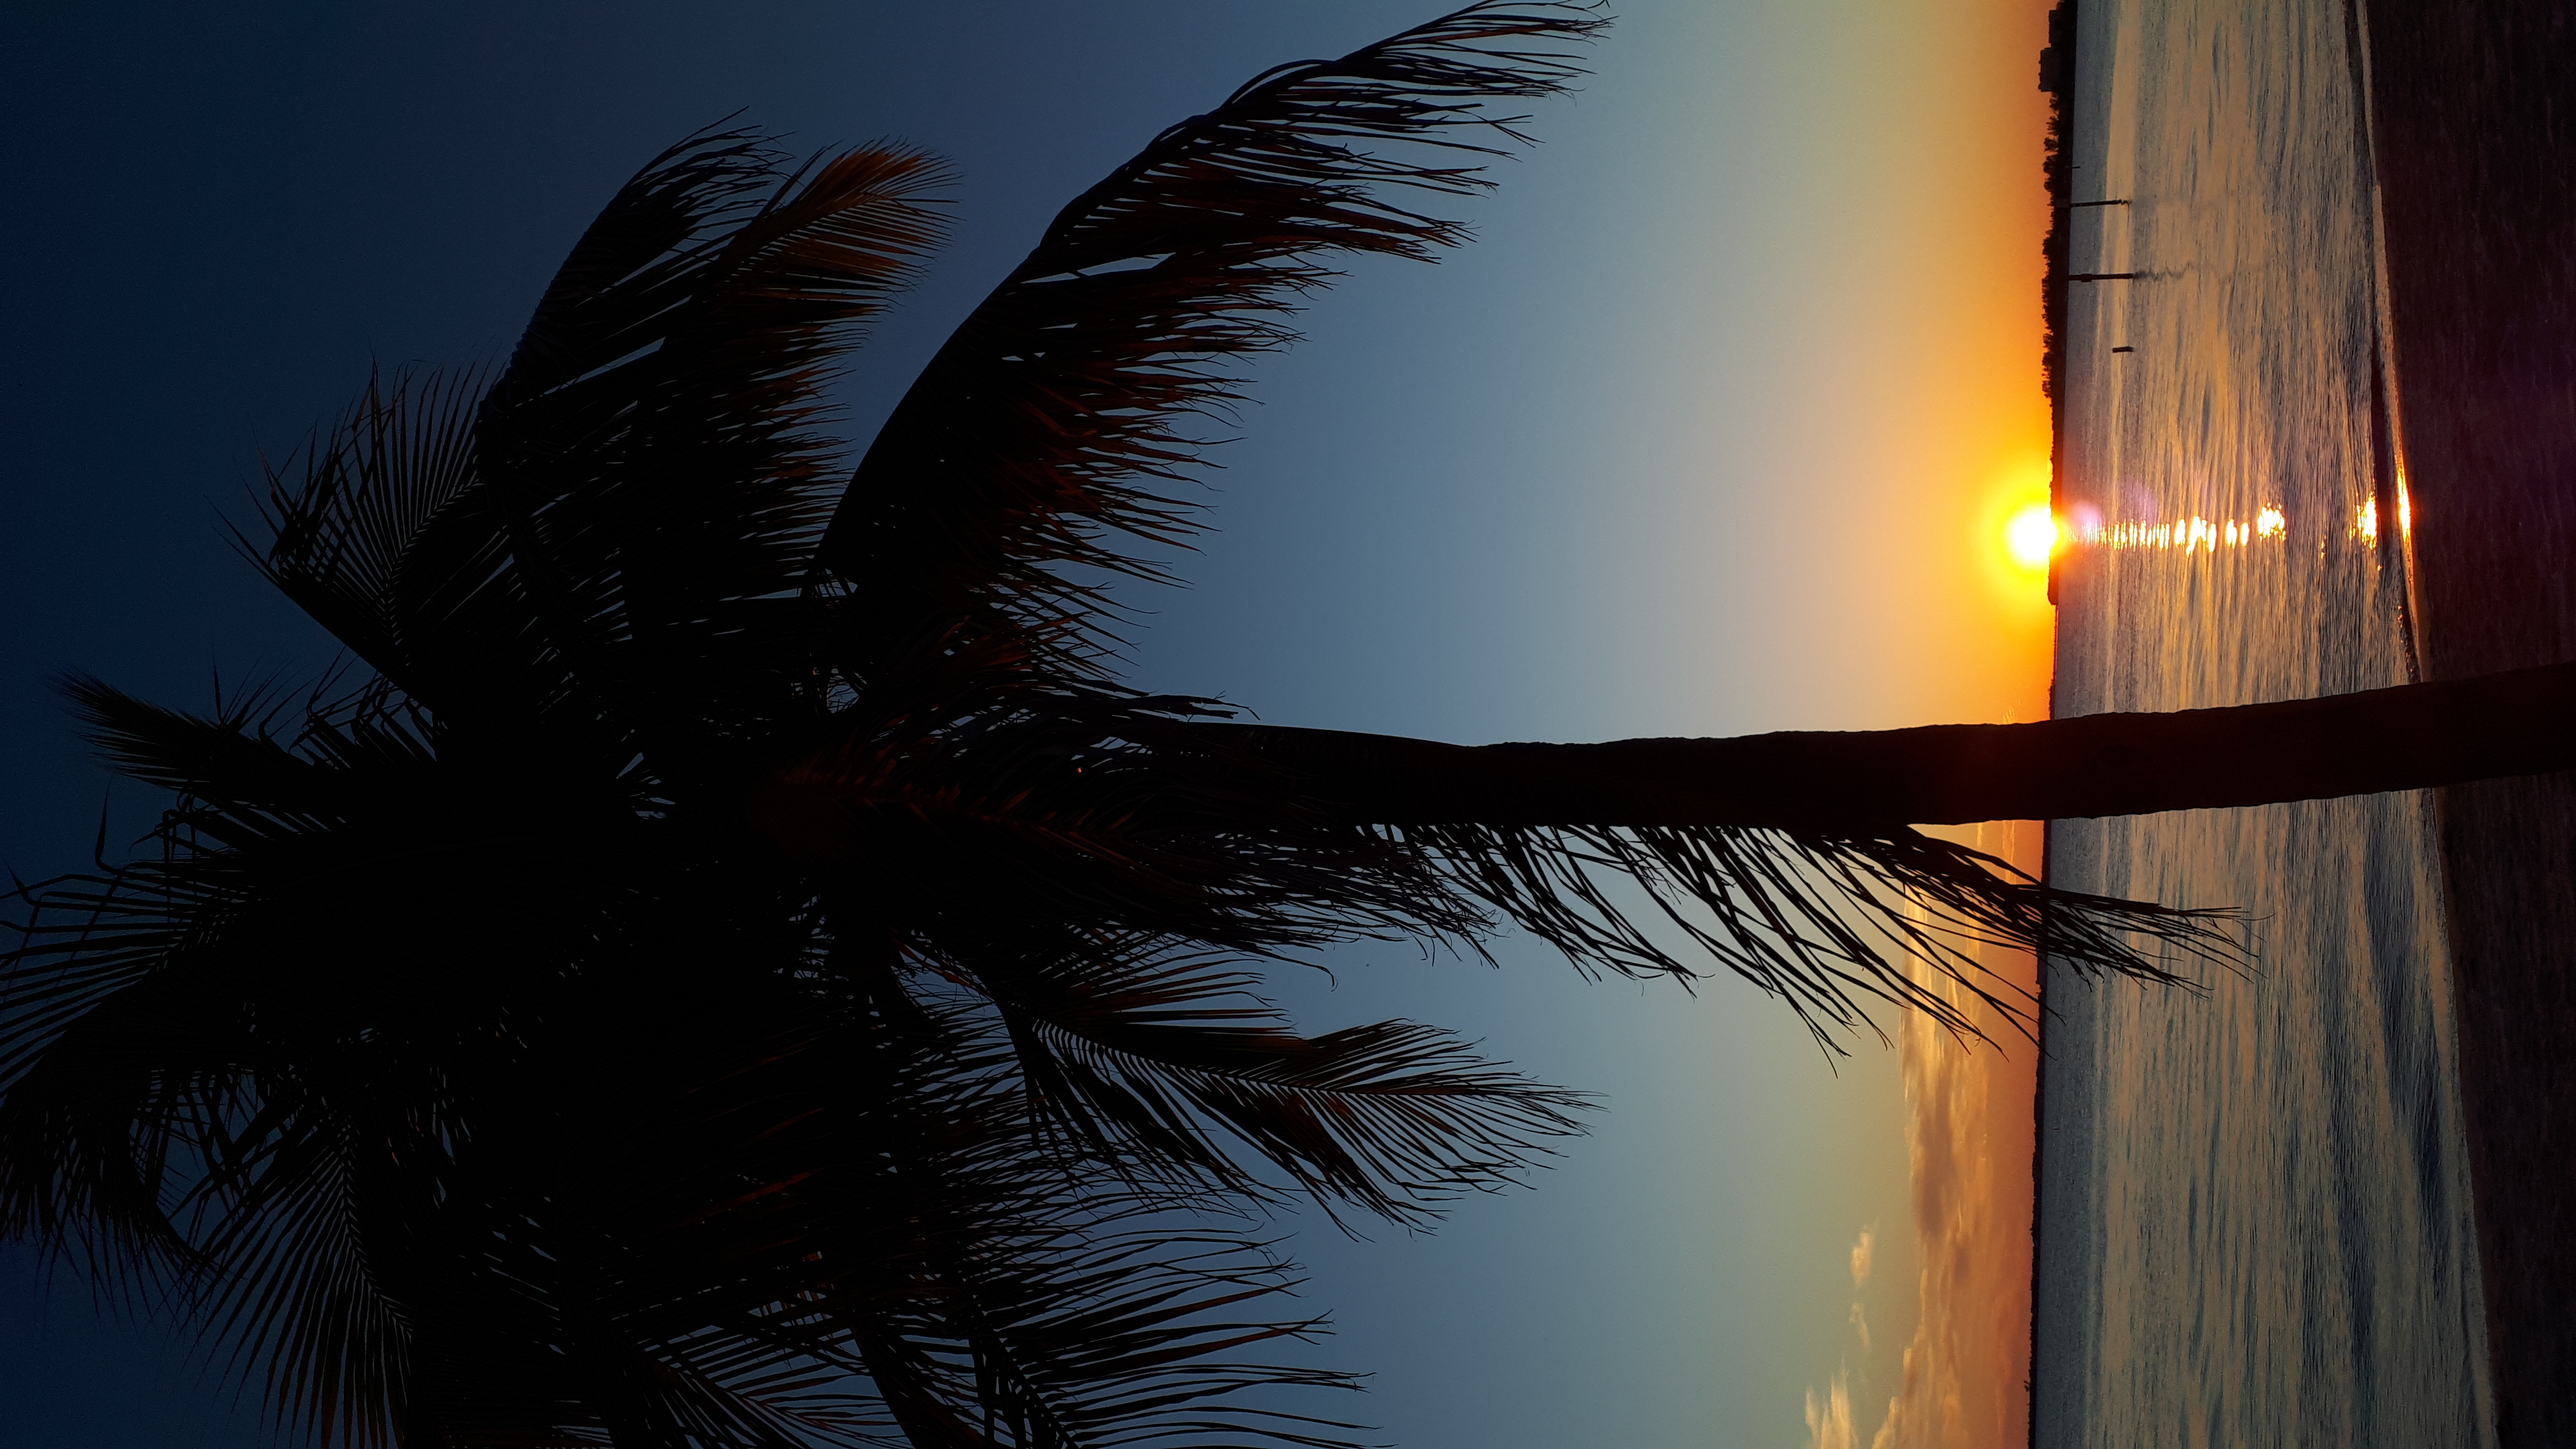 Sonnenuntergang am Strand von Cape Coral